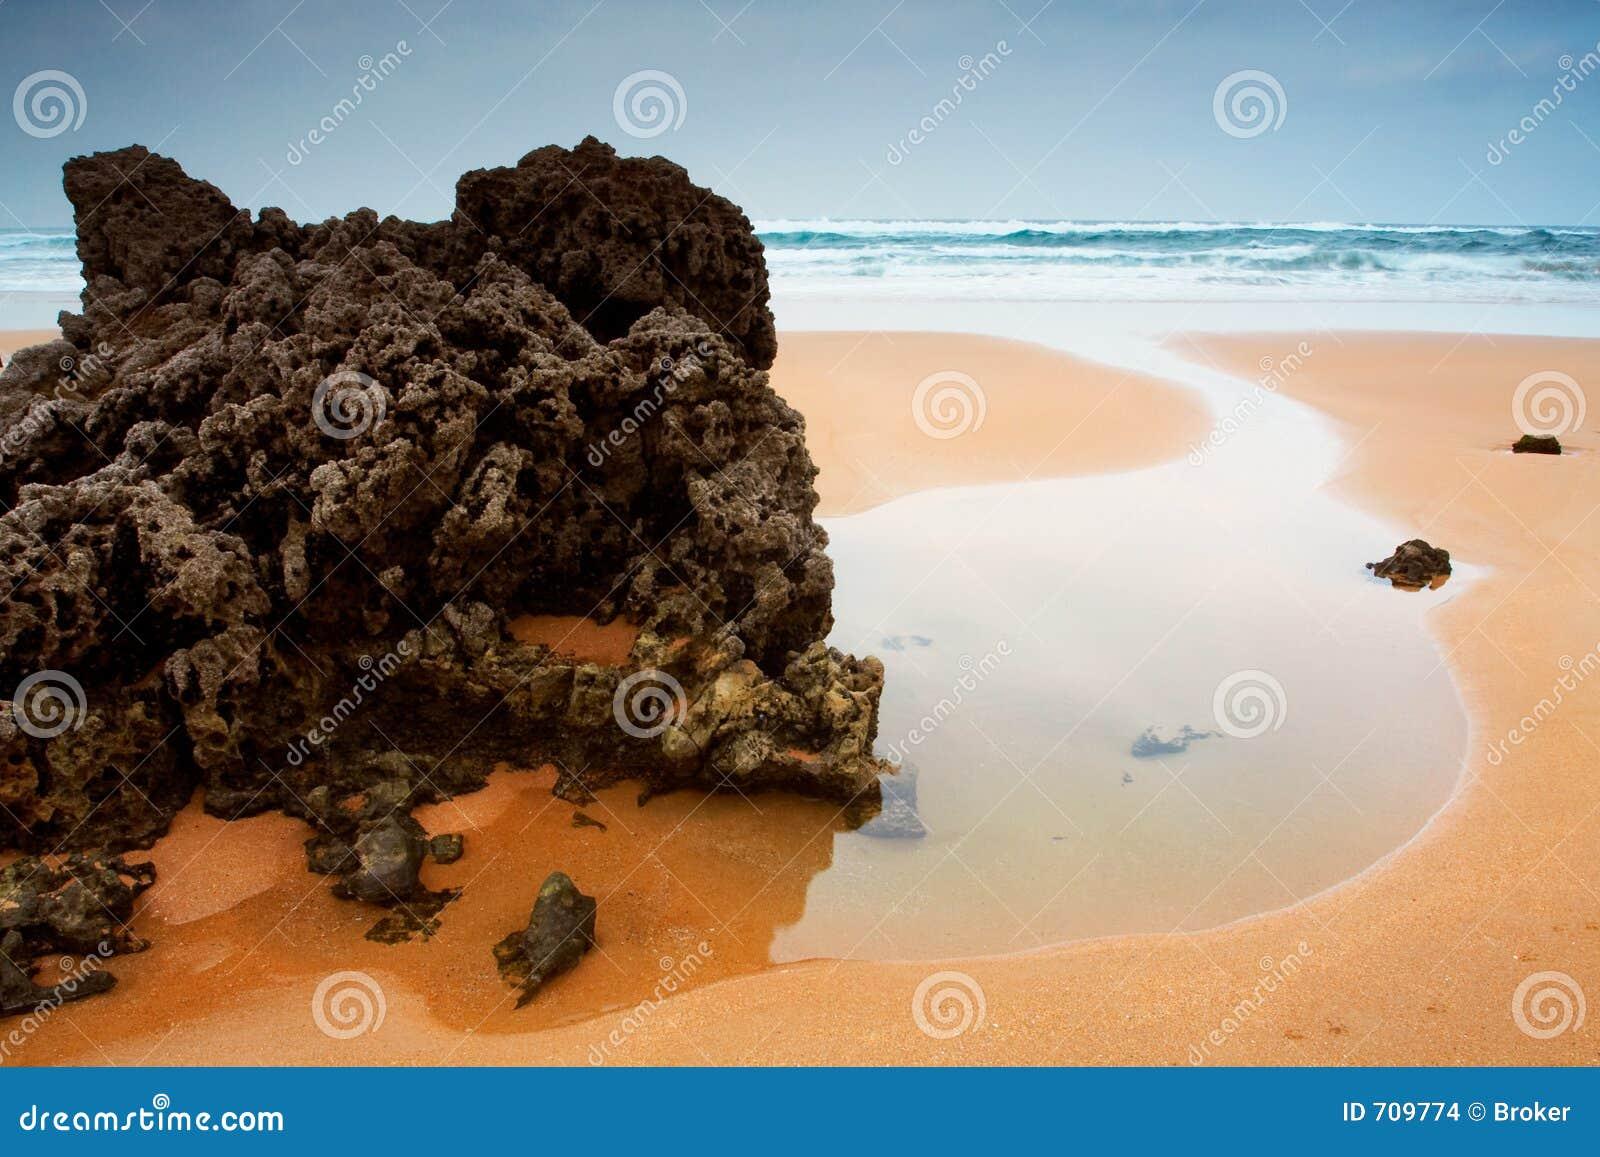 Praia de Valdearenas. Spain